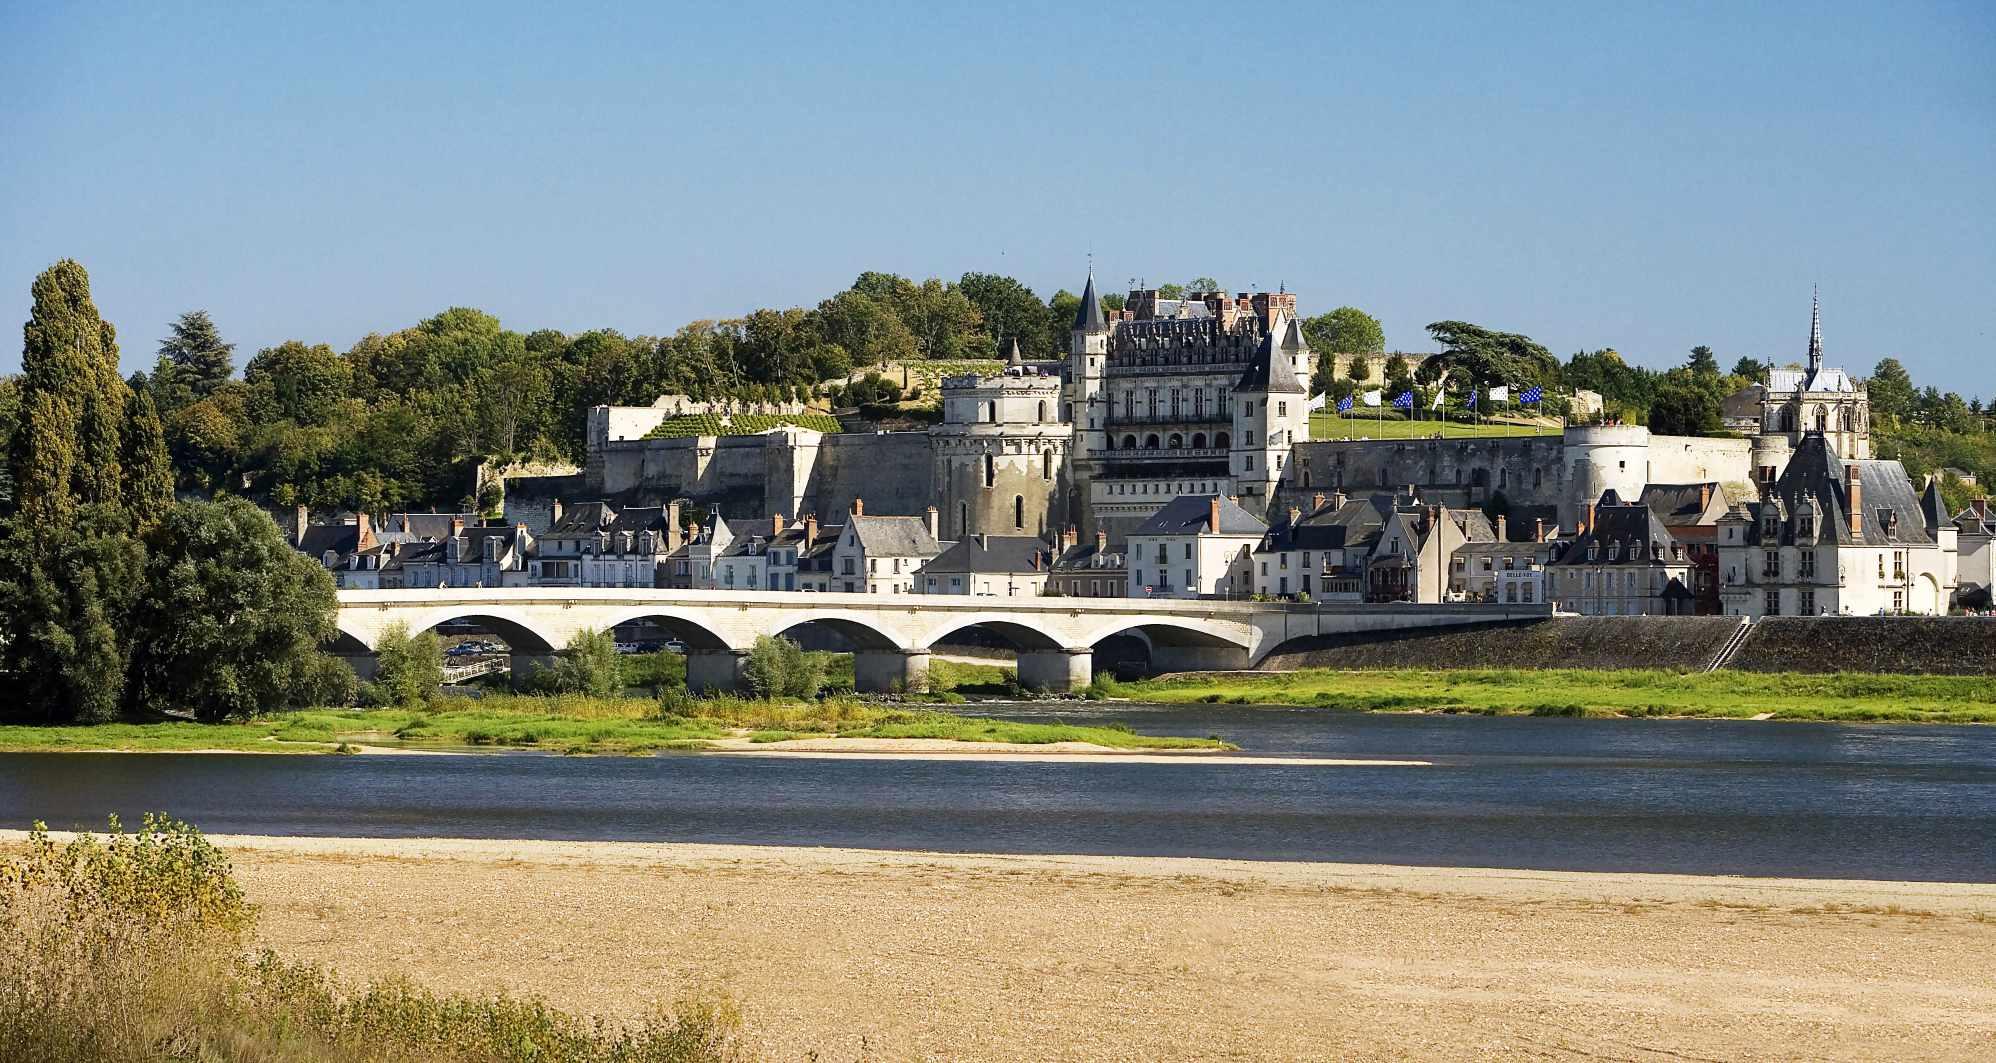 Chateau Choiseal, France